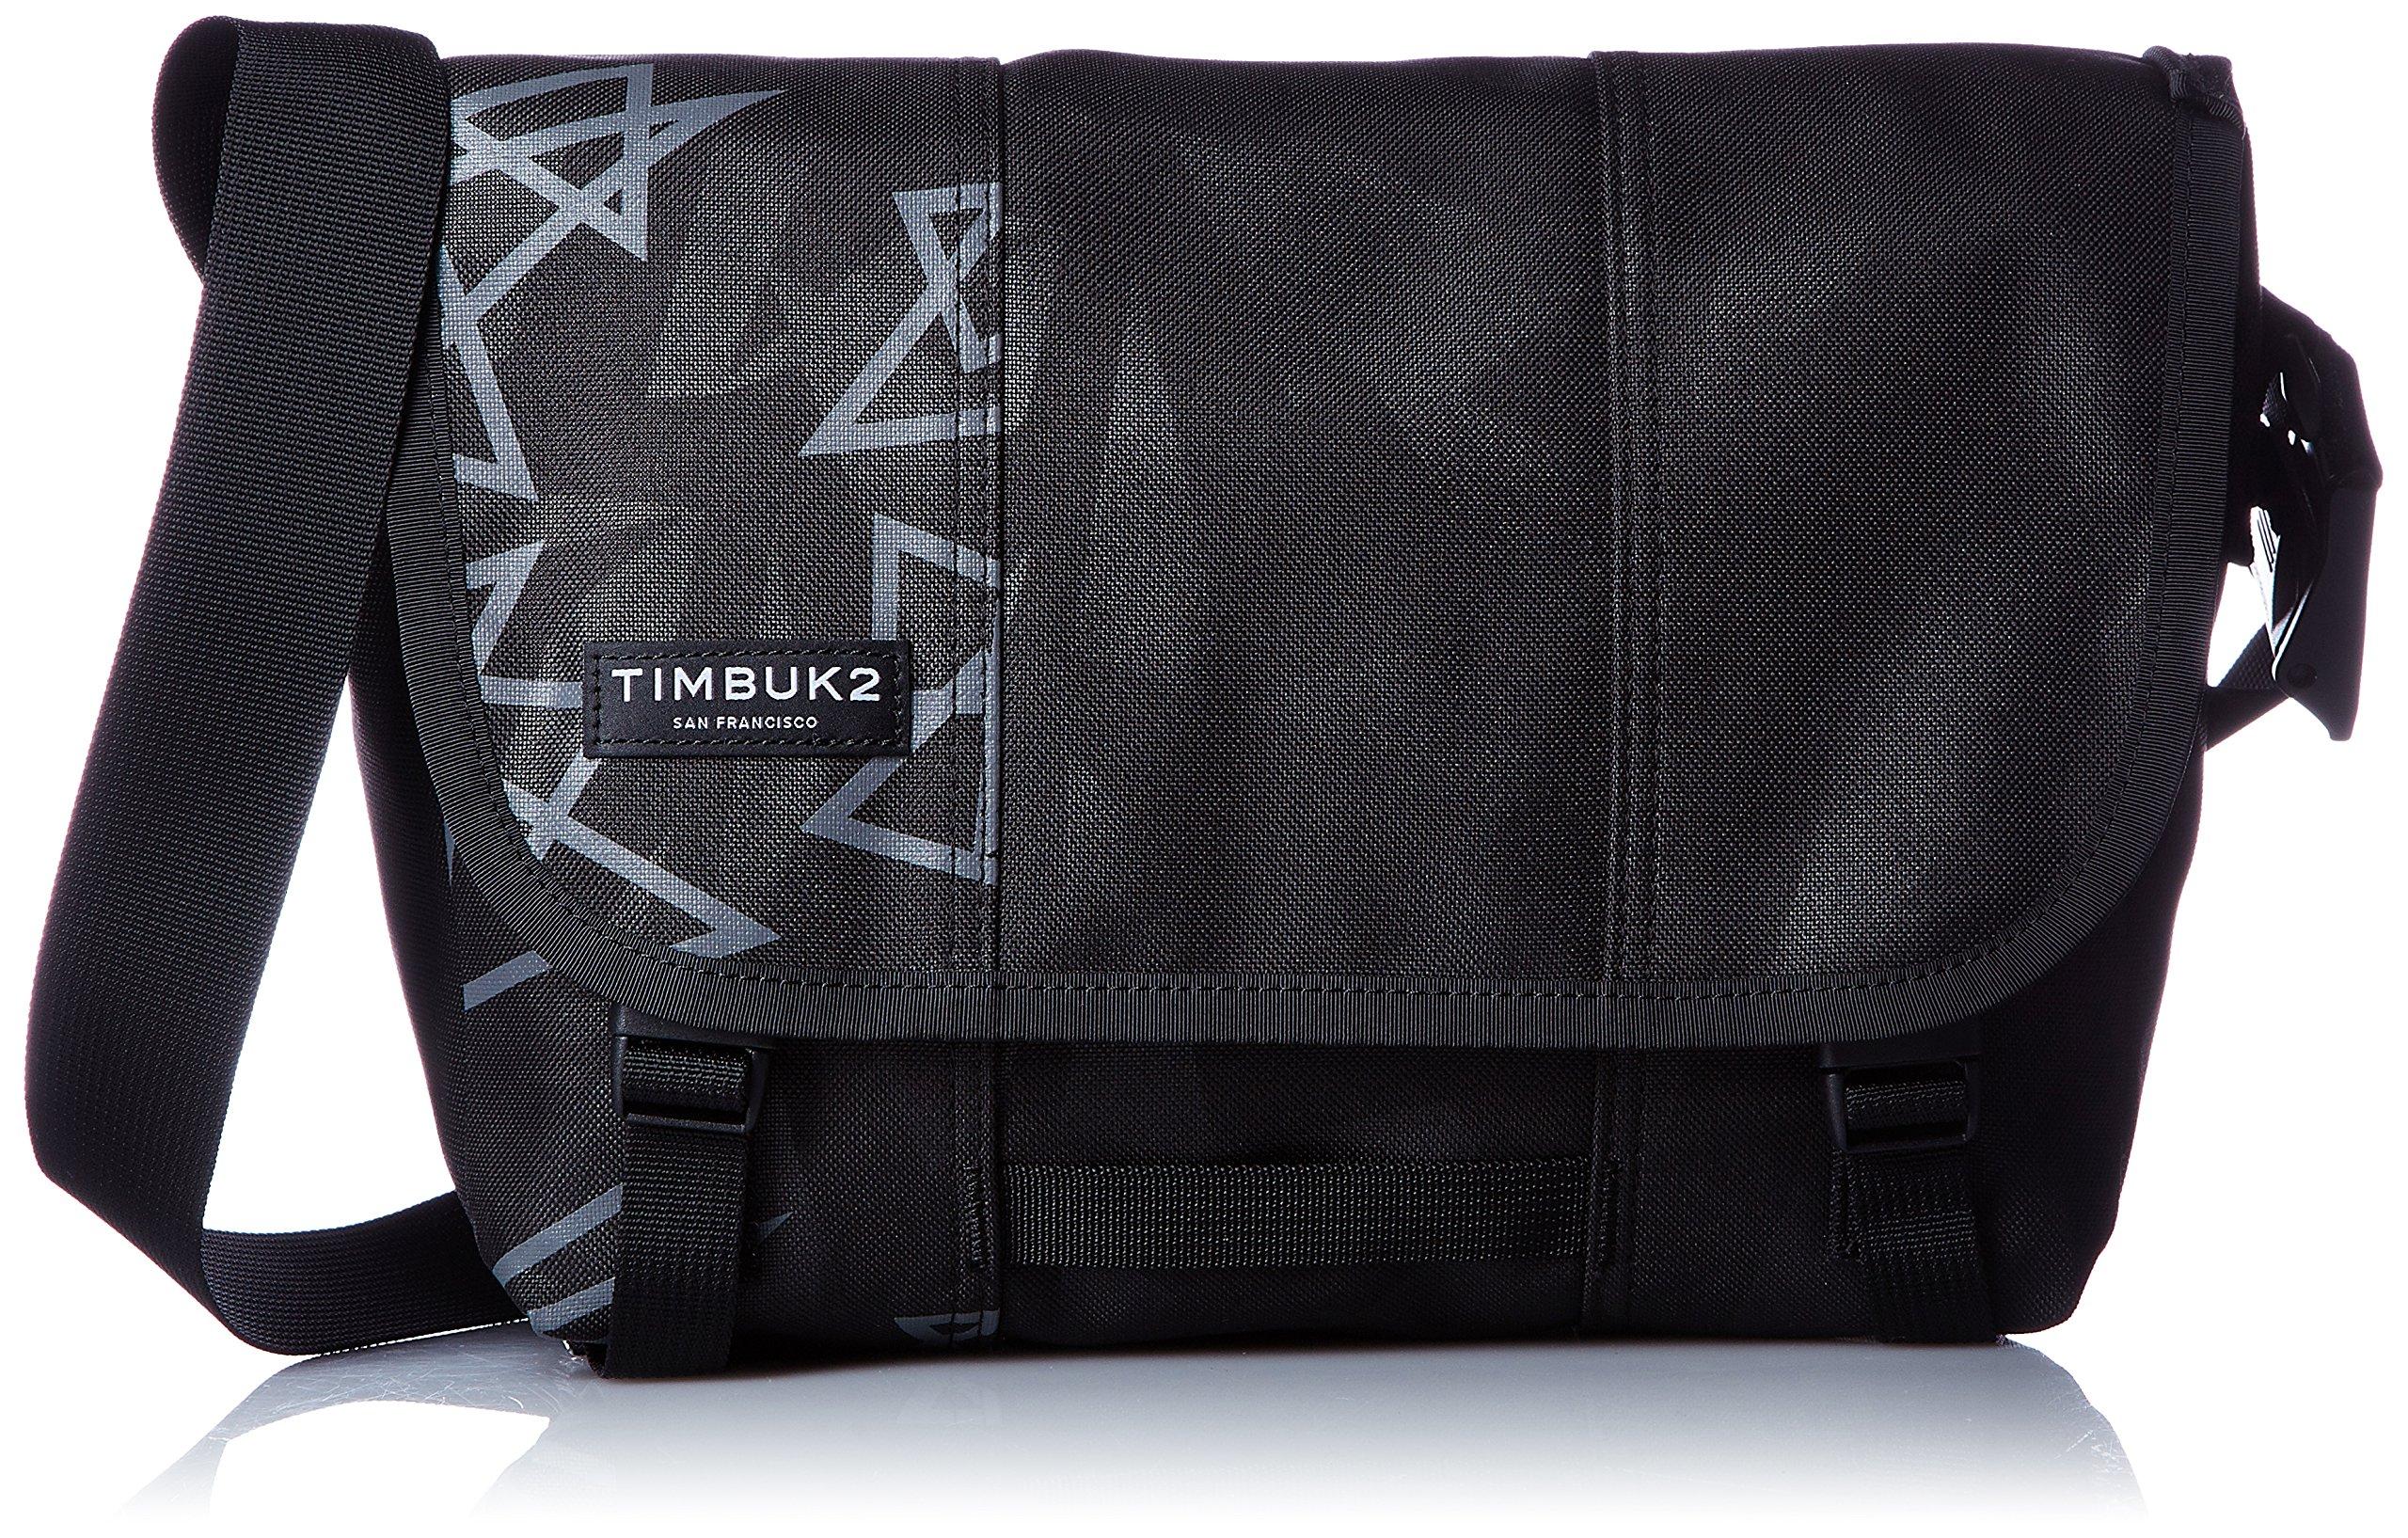 Timbuk2 Classic Print Messenger Bag Triangle Emboss, X-Small by Timbuk2